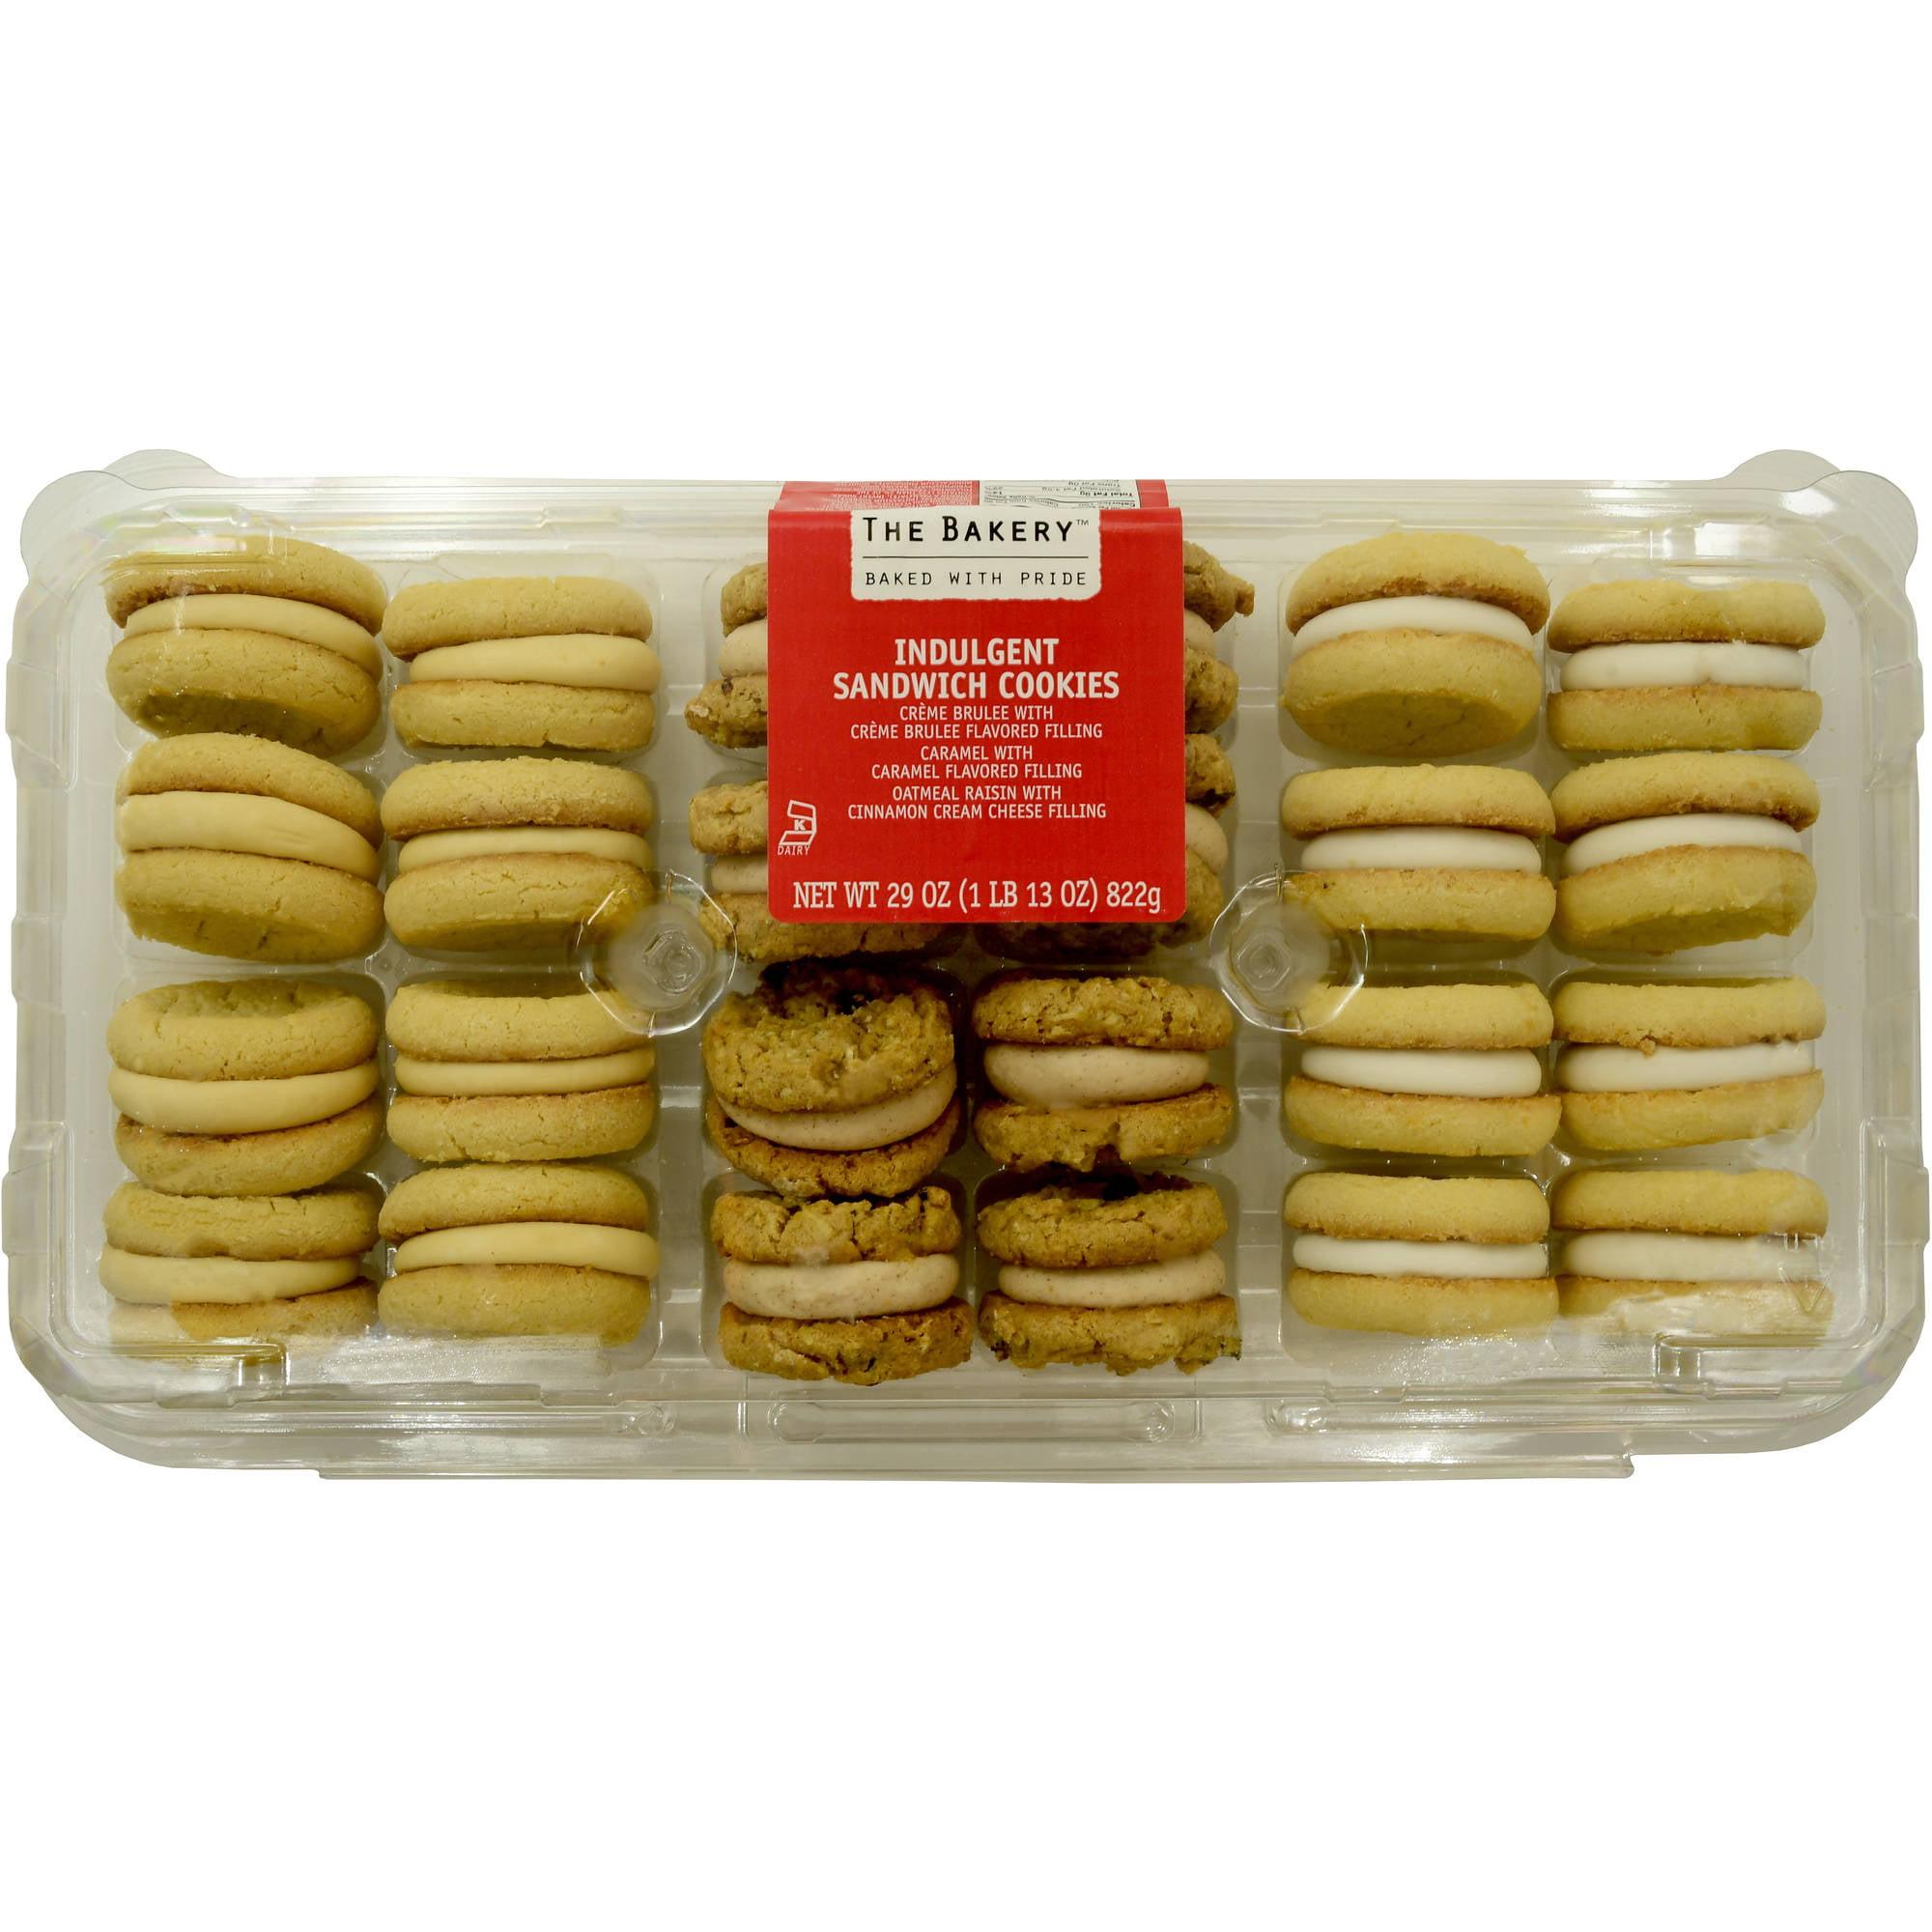 The  Bakery at Walmart Variety Sandwich Cookies: crème brulee, caramel, oatmeal raisin